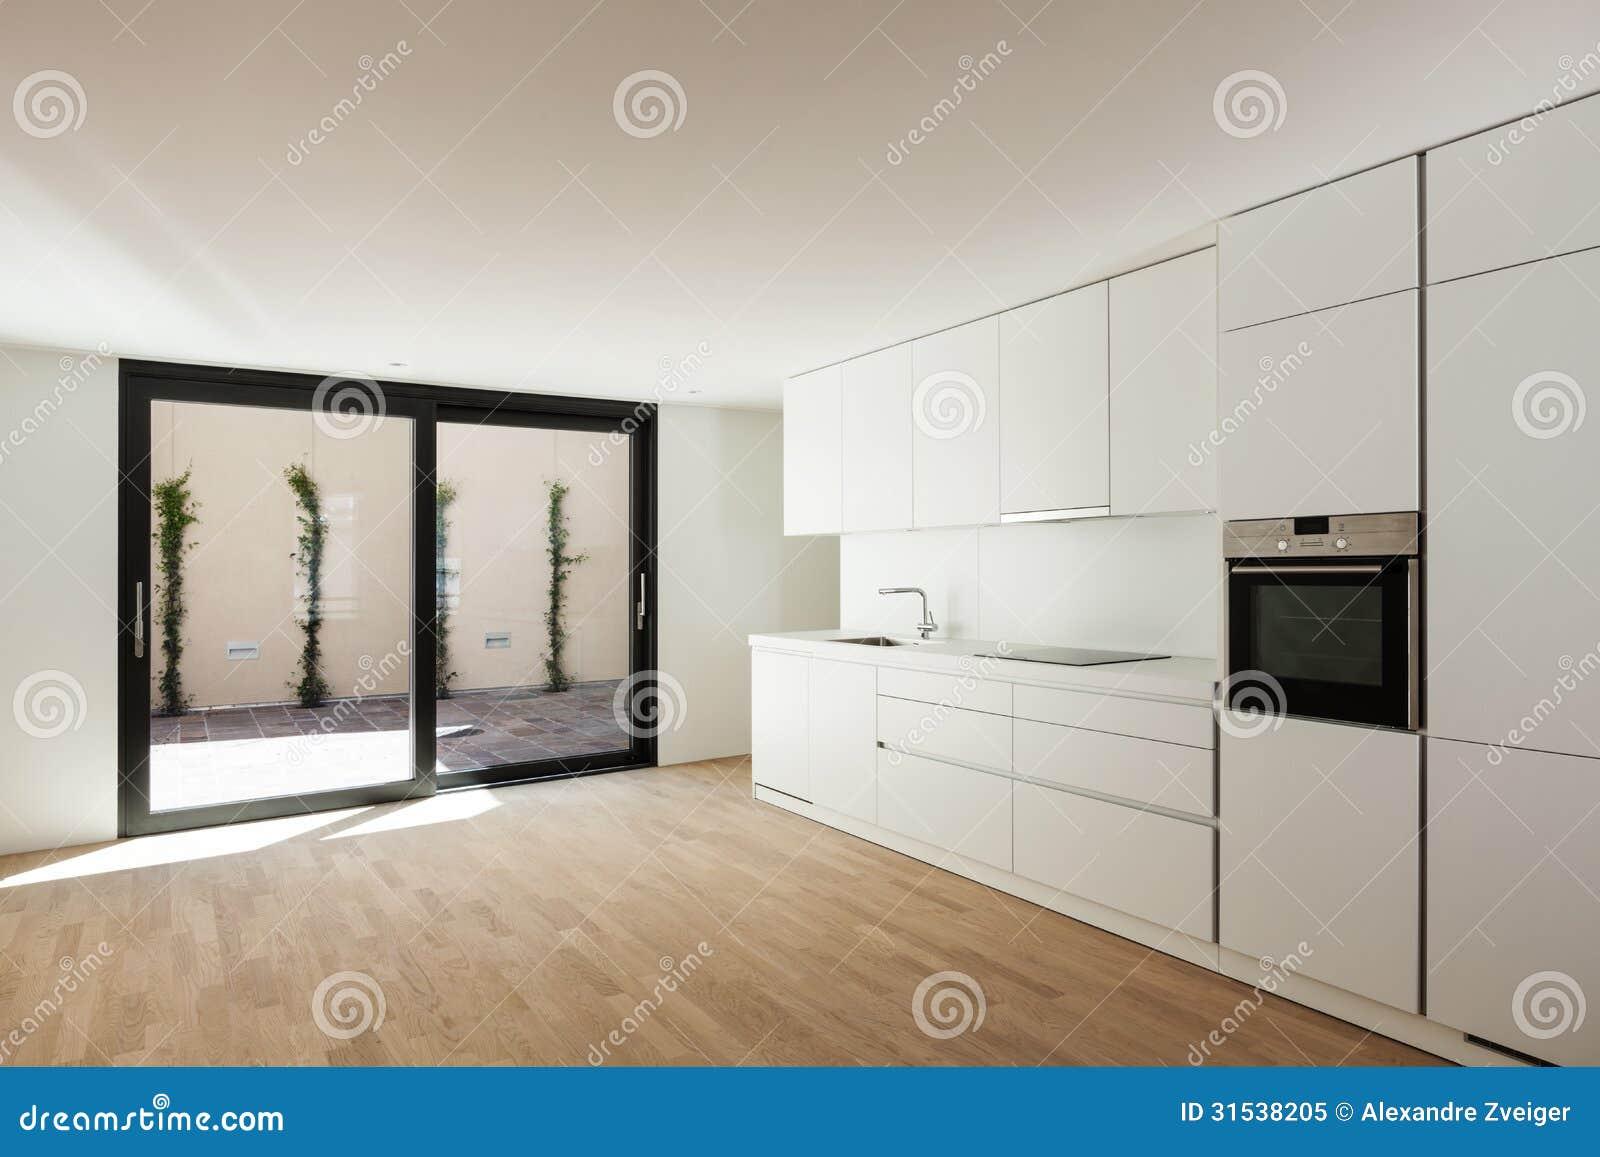 Cucina bianca moderna fotografia stock libera da diritti for Casa moderna bianca